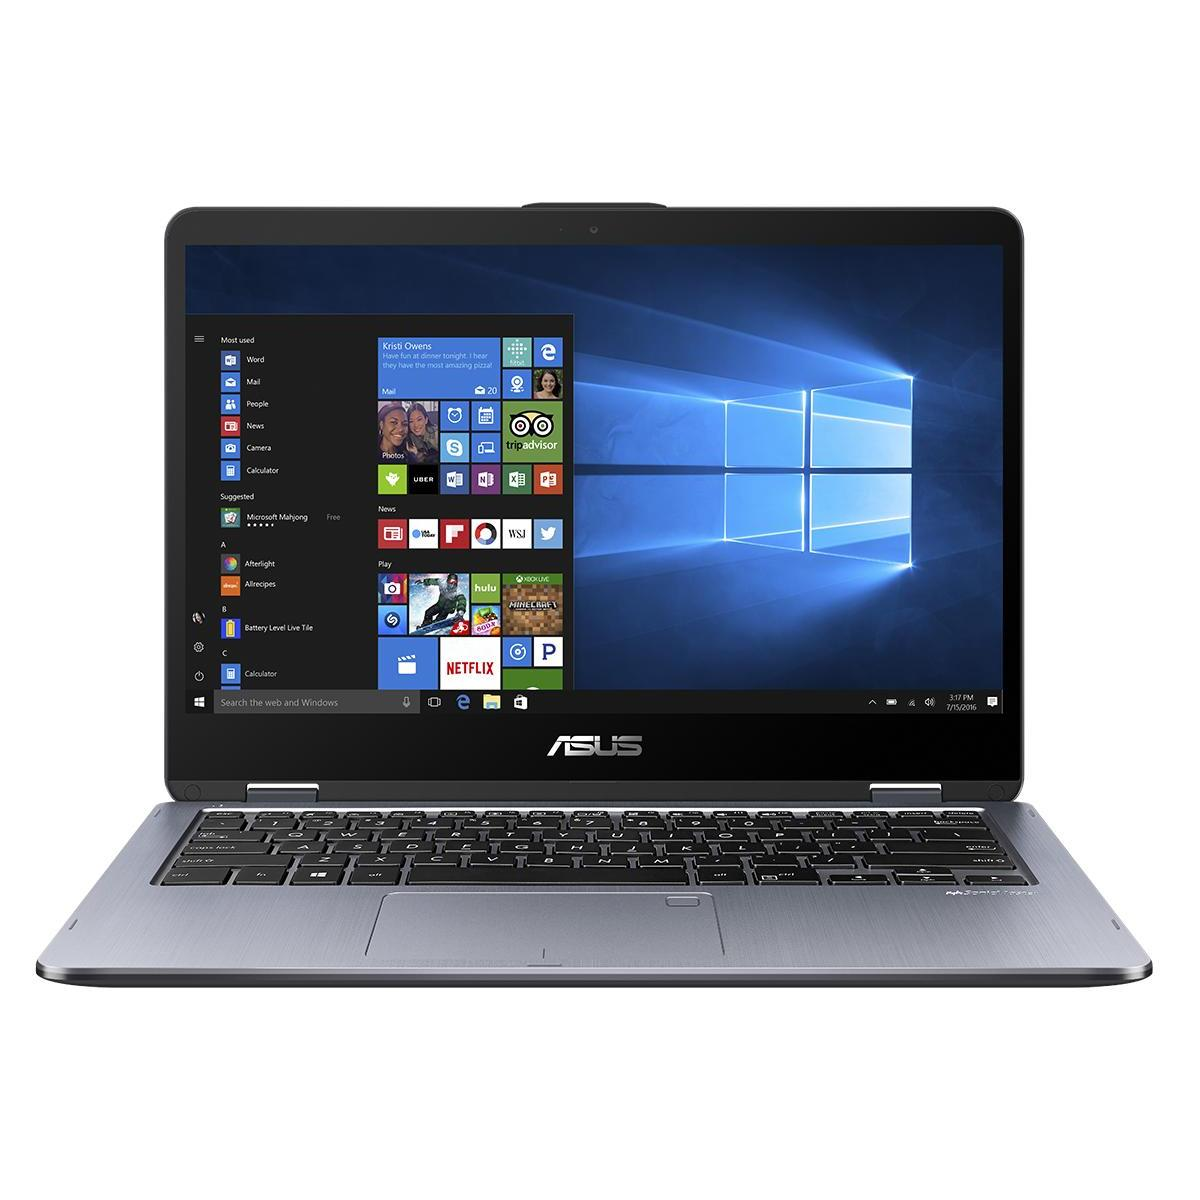 "ASUS Vivobook Flip Tp410Ua-Ec474T (14"" FHD IPS,Intel Core i7-8550U,8GB,Intel HD Graphics 620,128GB SSD + 1TB HDD)"